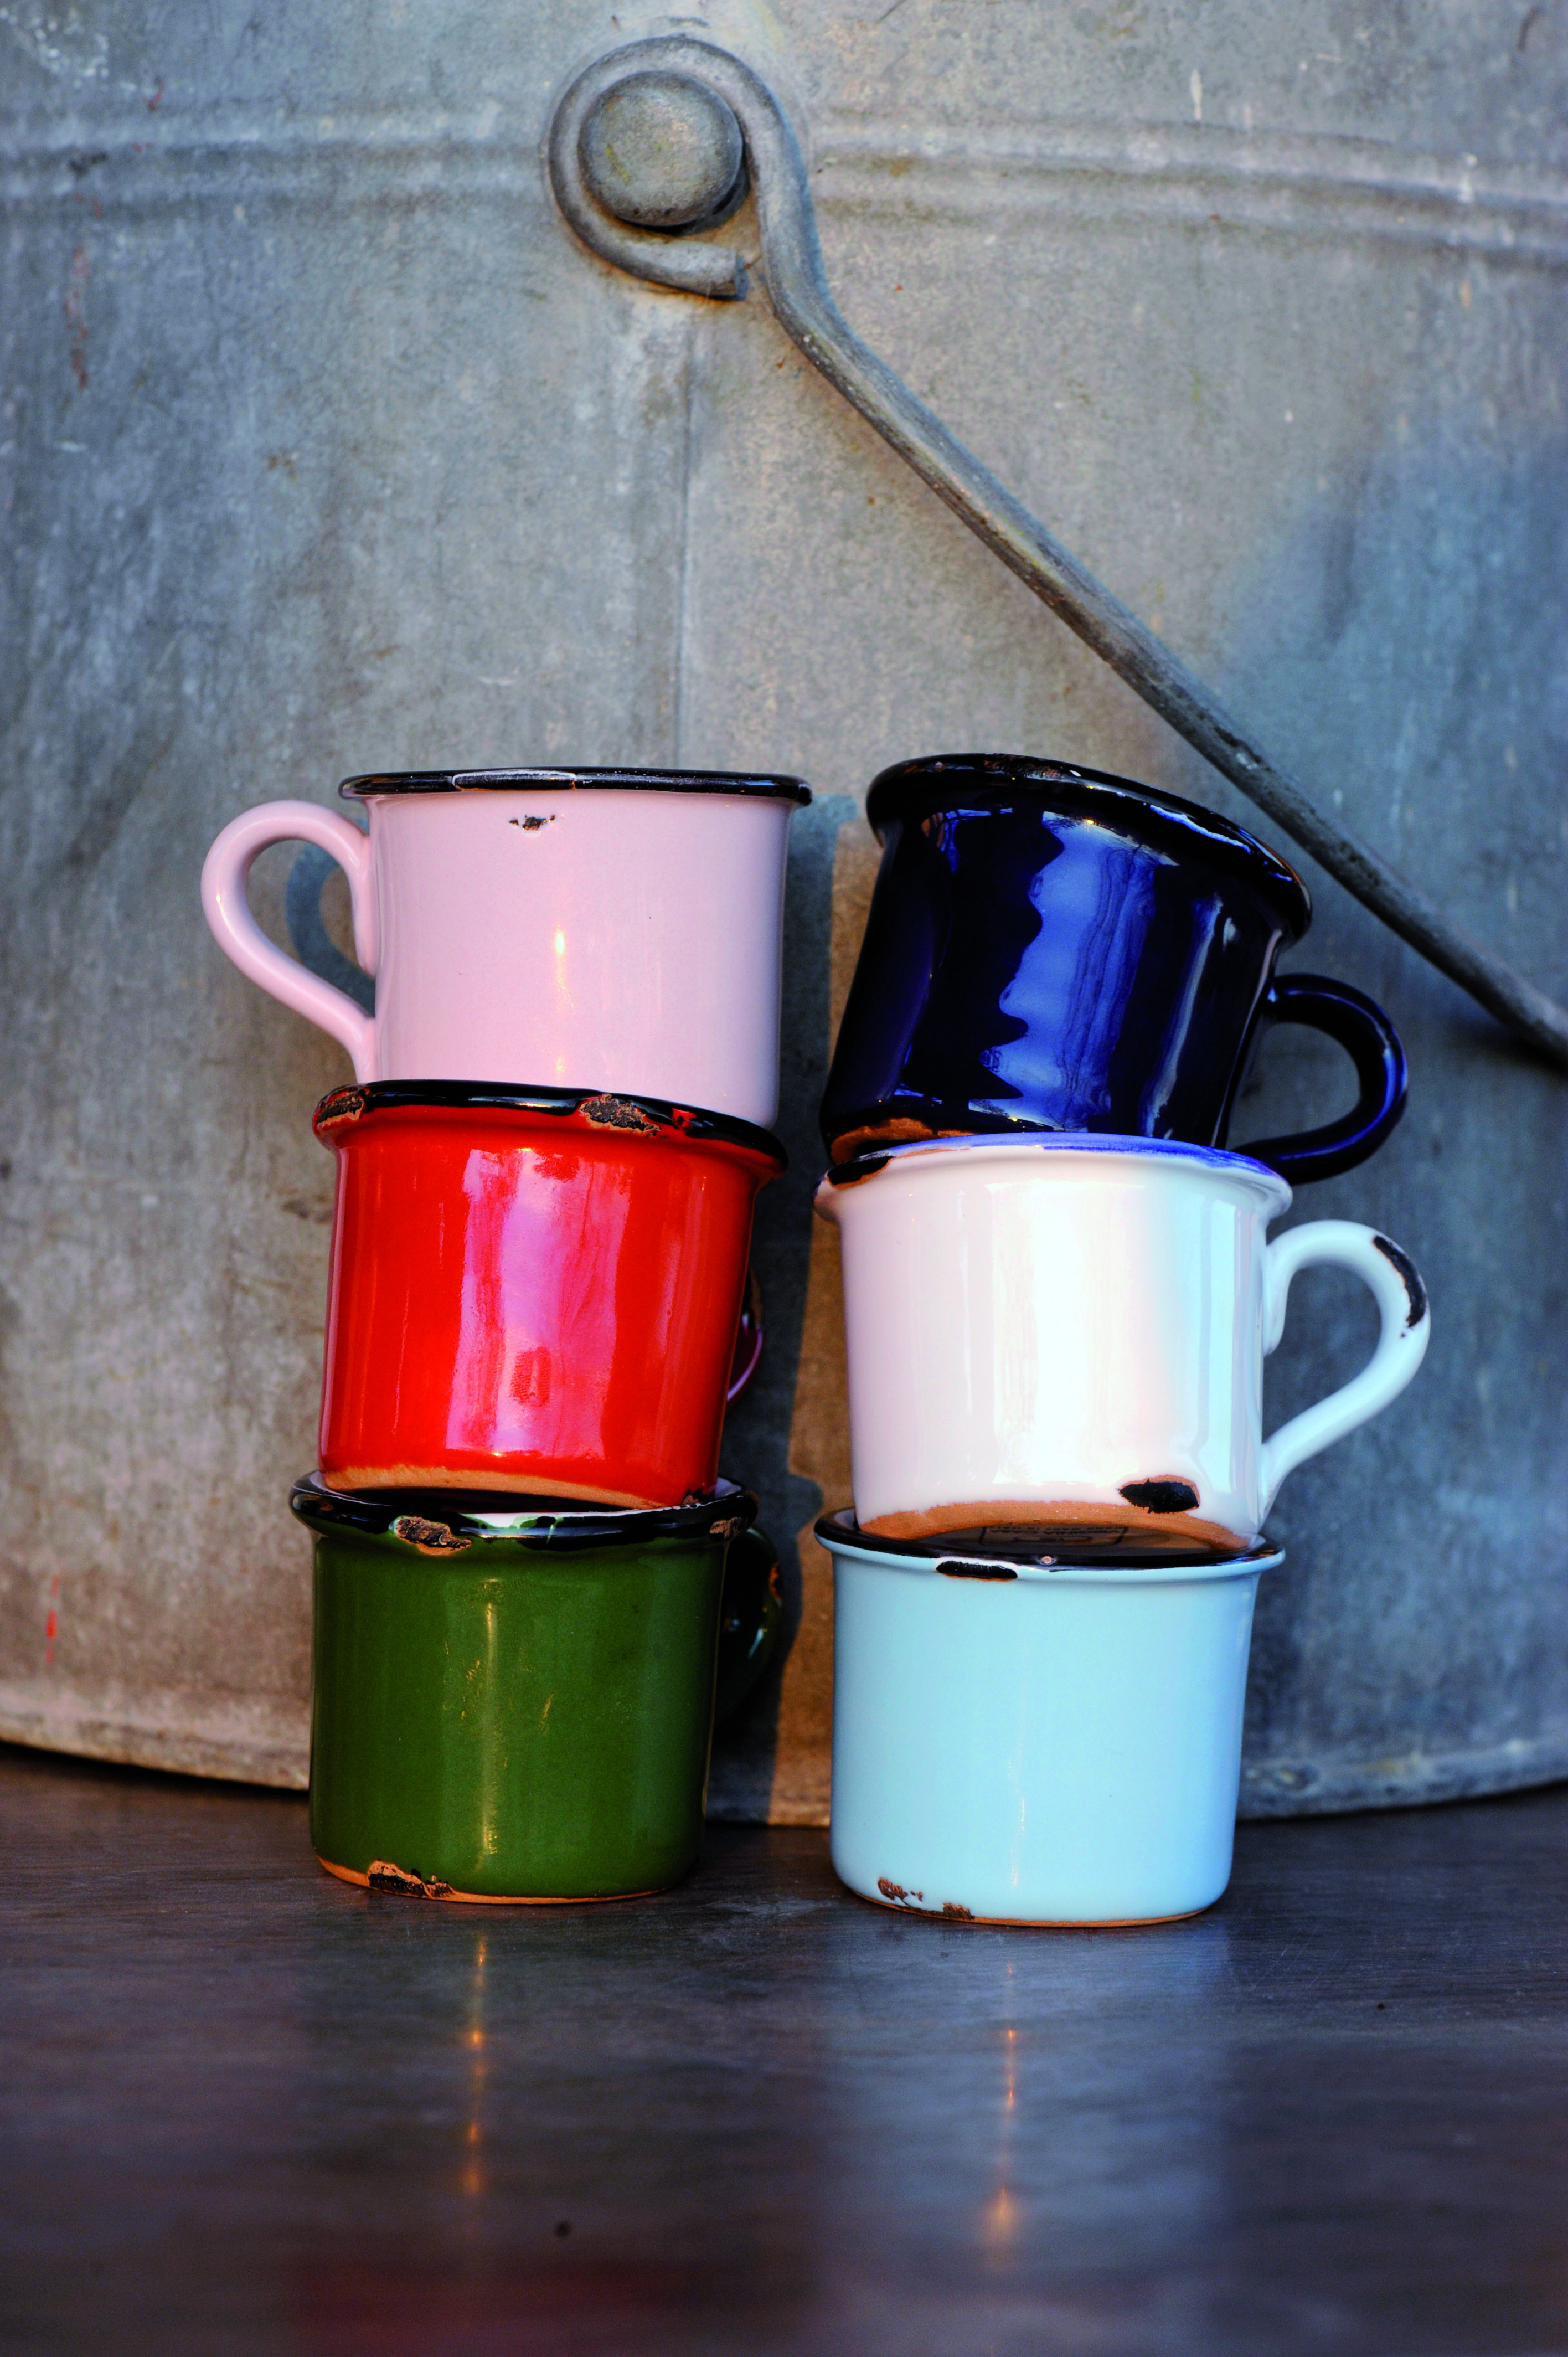 gabi schott living 6 espressotassen farbig italienische keramik handarbeit virginia casa. Black Bedroom Furniture Sets. Home Design Ideas